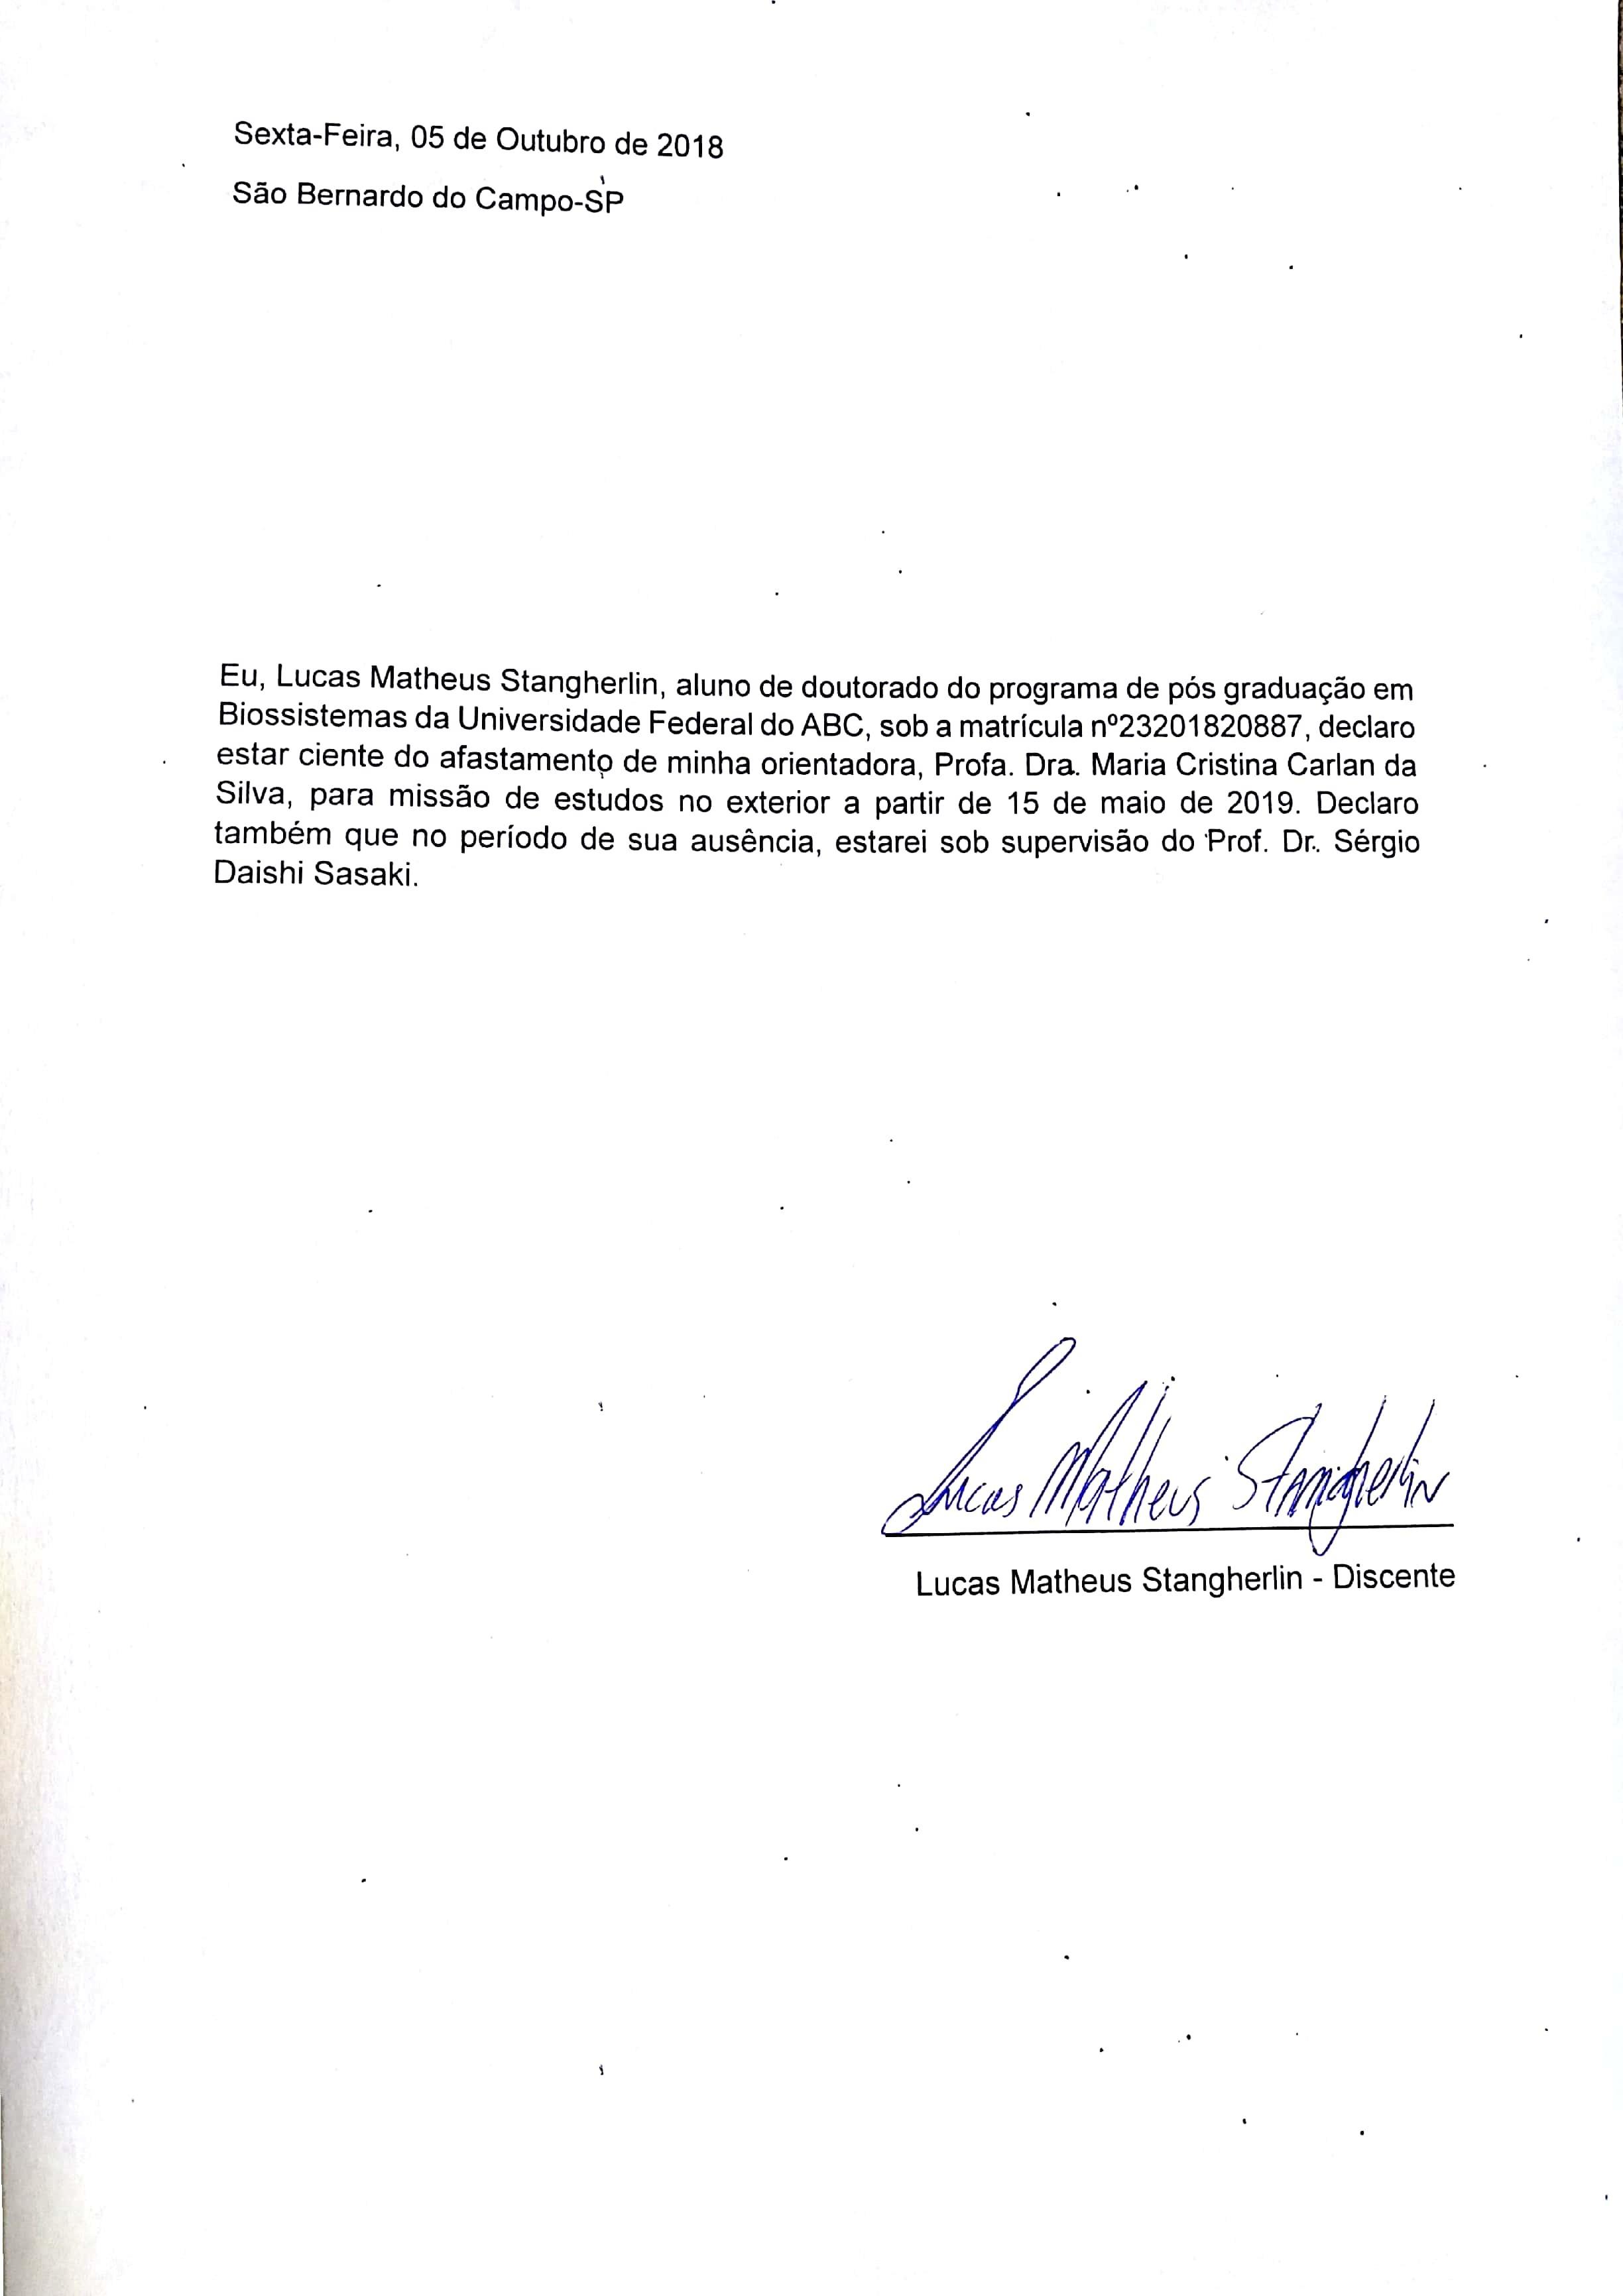 Calendario 2020 Ufabc Más Arriba-a-fecha Ccnh Centro De Ciªncias Naturais E Humanas Ufabc Of Calendario 2020 Ufabc Mejores Y Más Novedosos Realiza